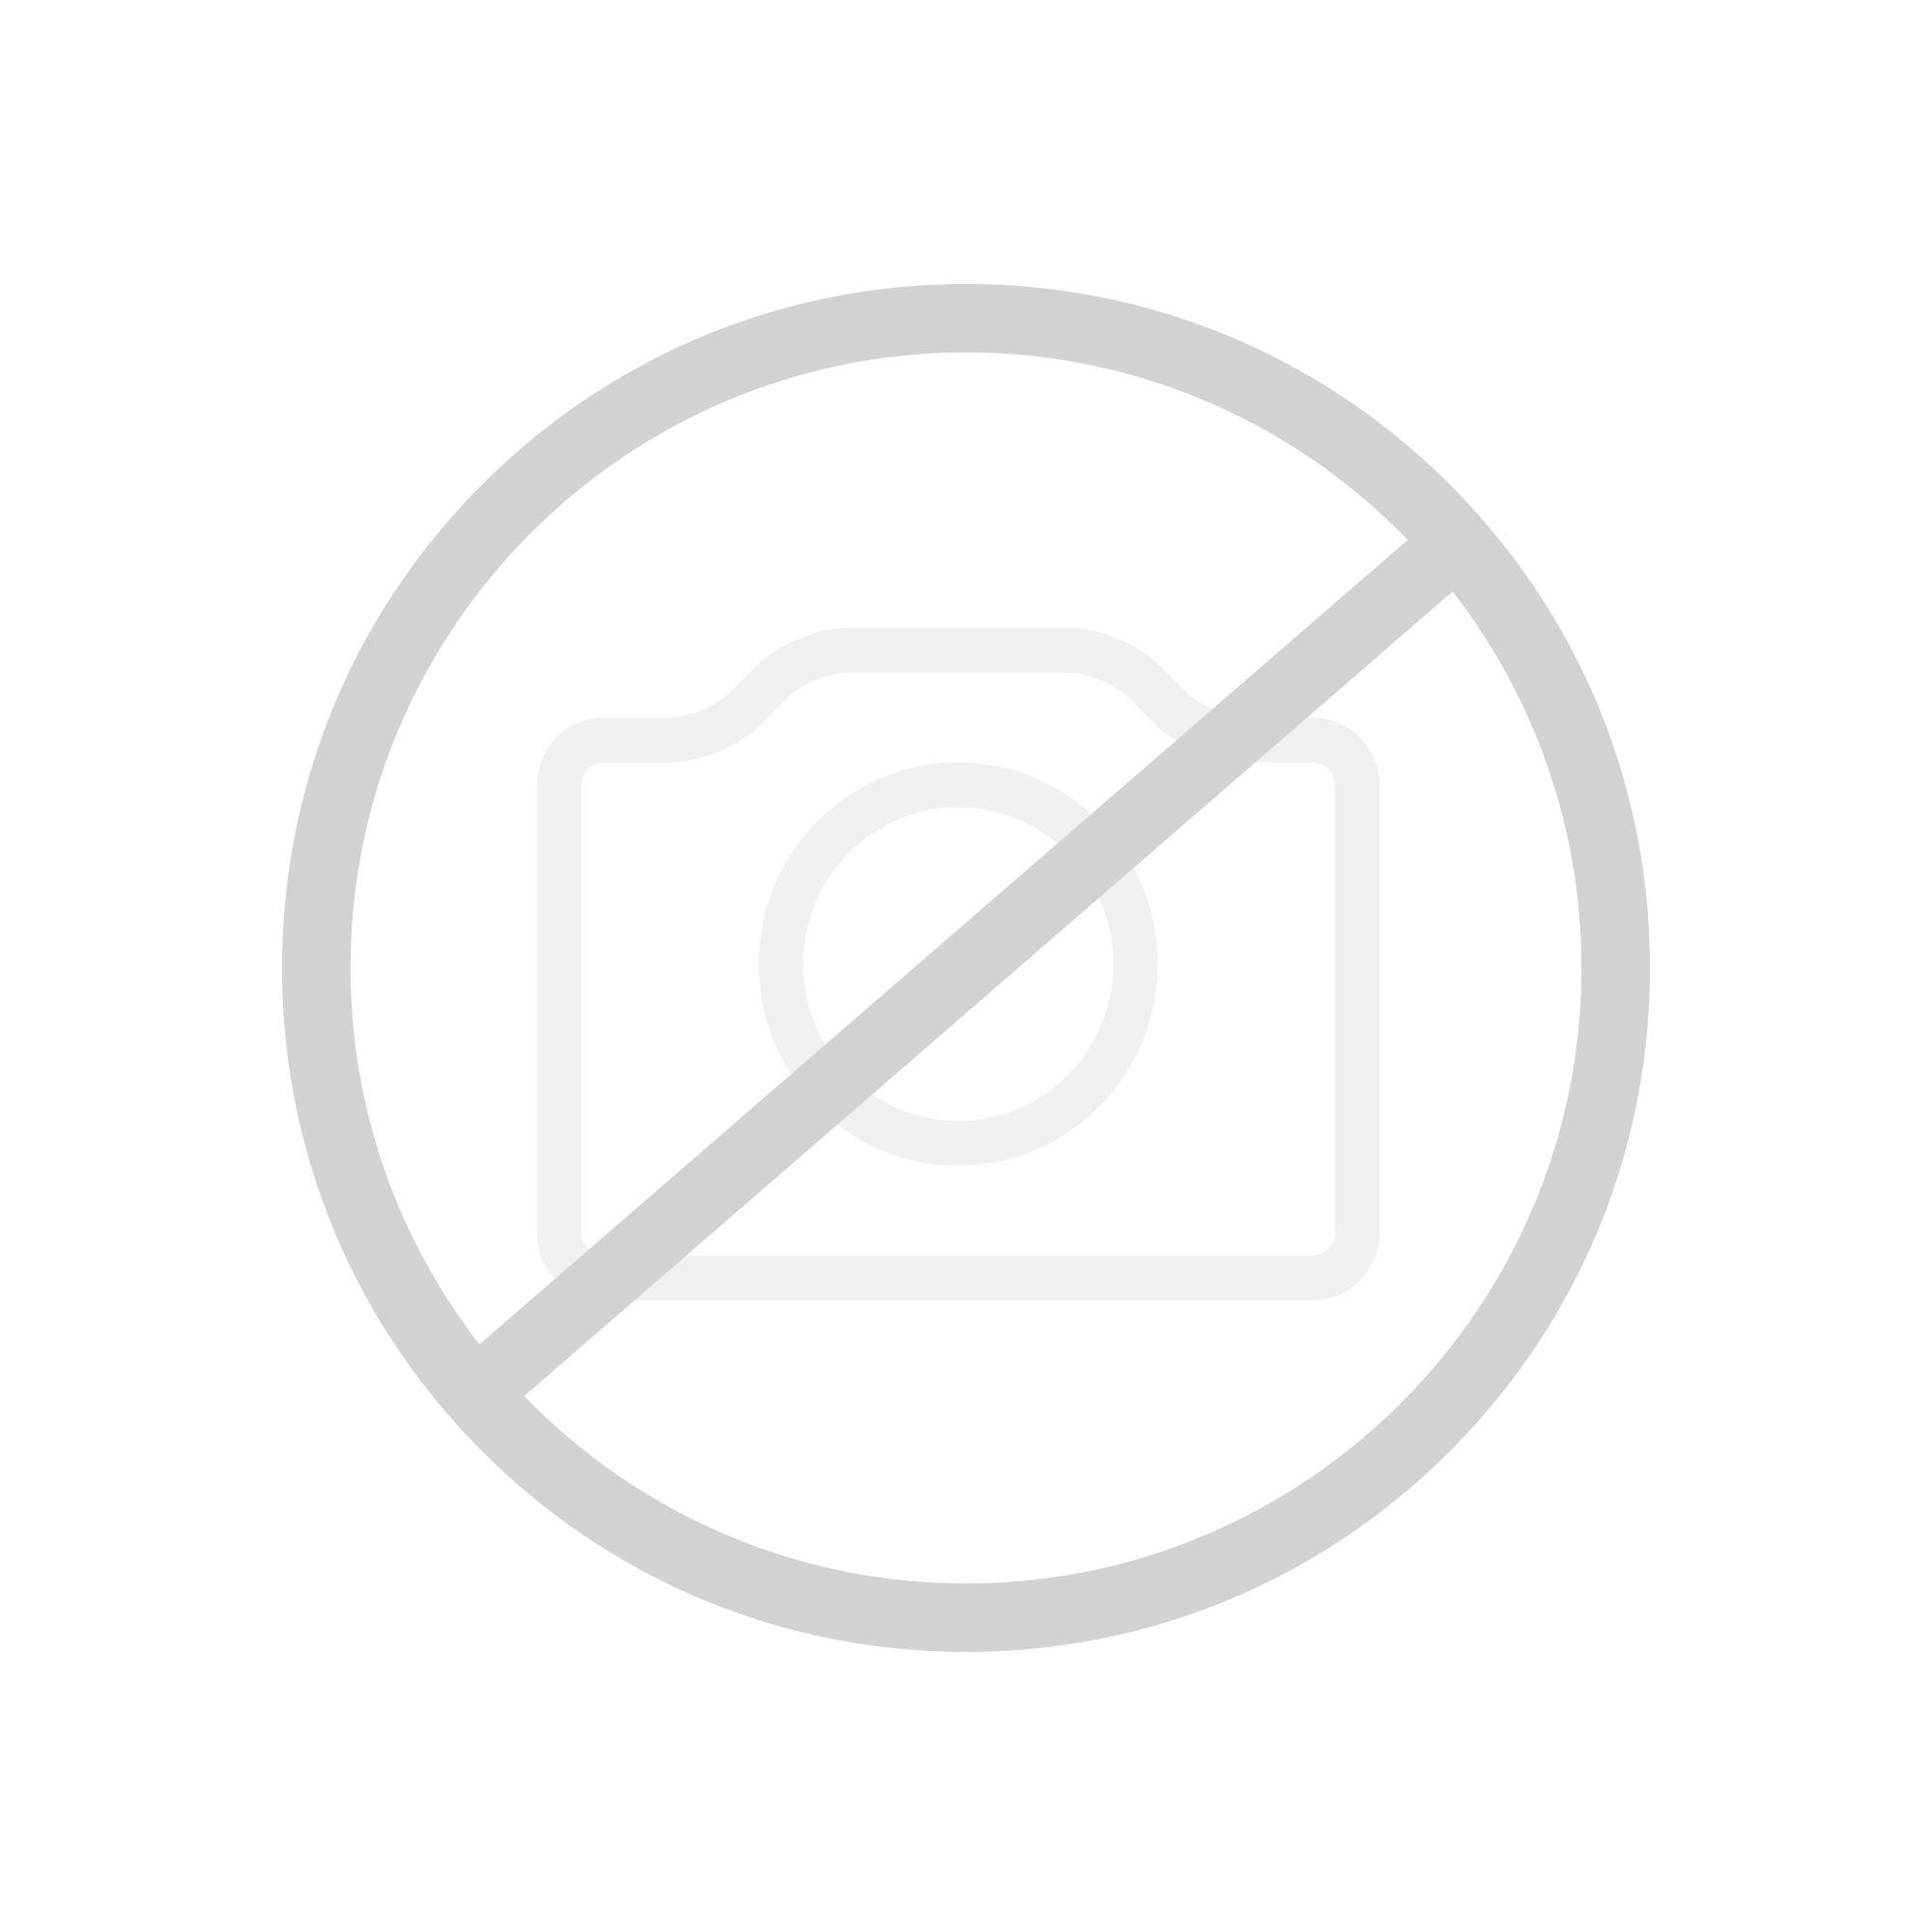 Ideal Standard Connect Wandtiefspülklosett spülrandlos L: 54 B: 36 cm weiß